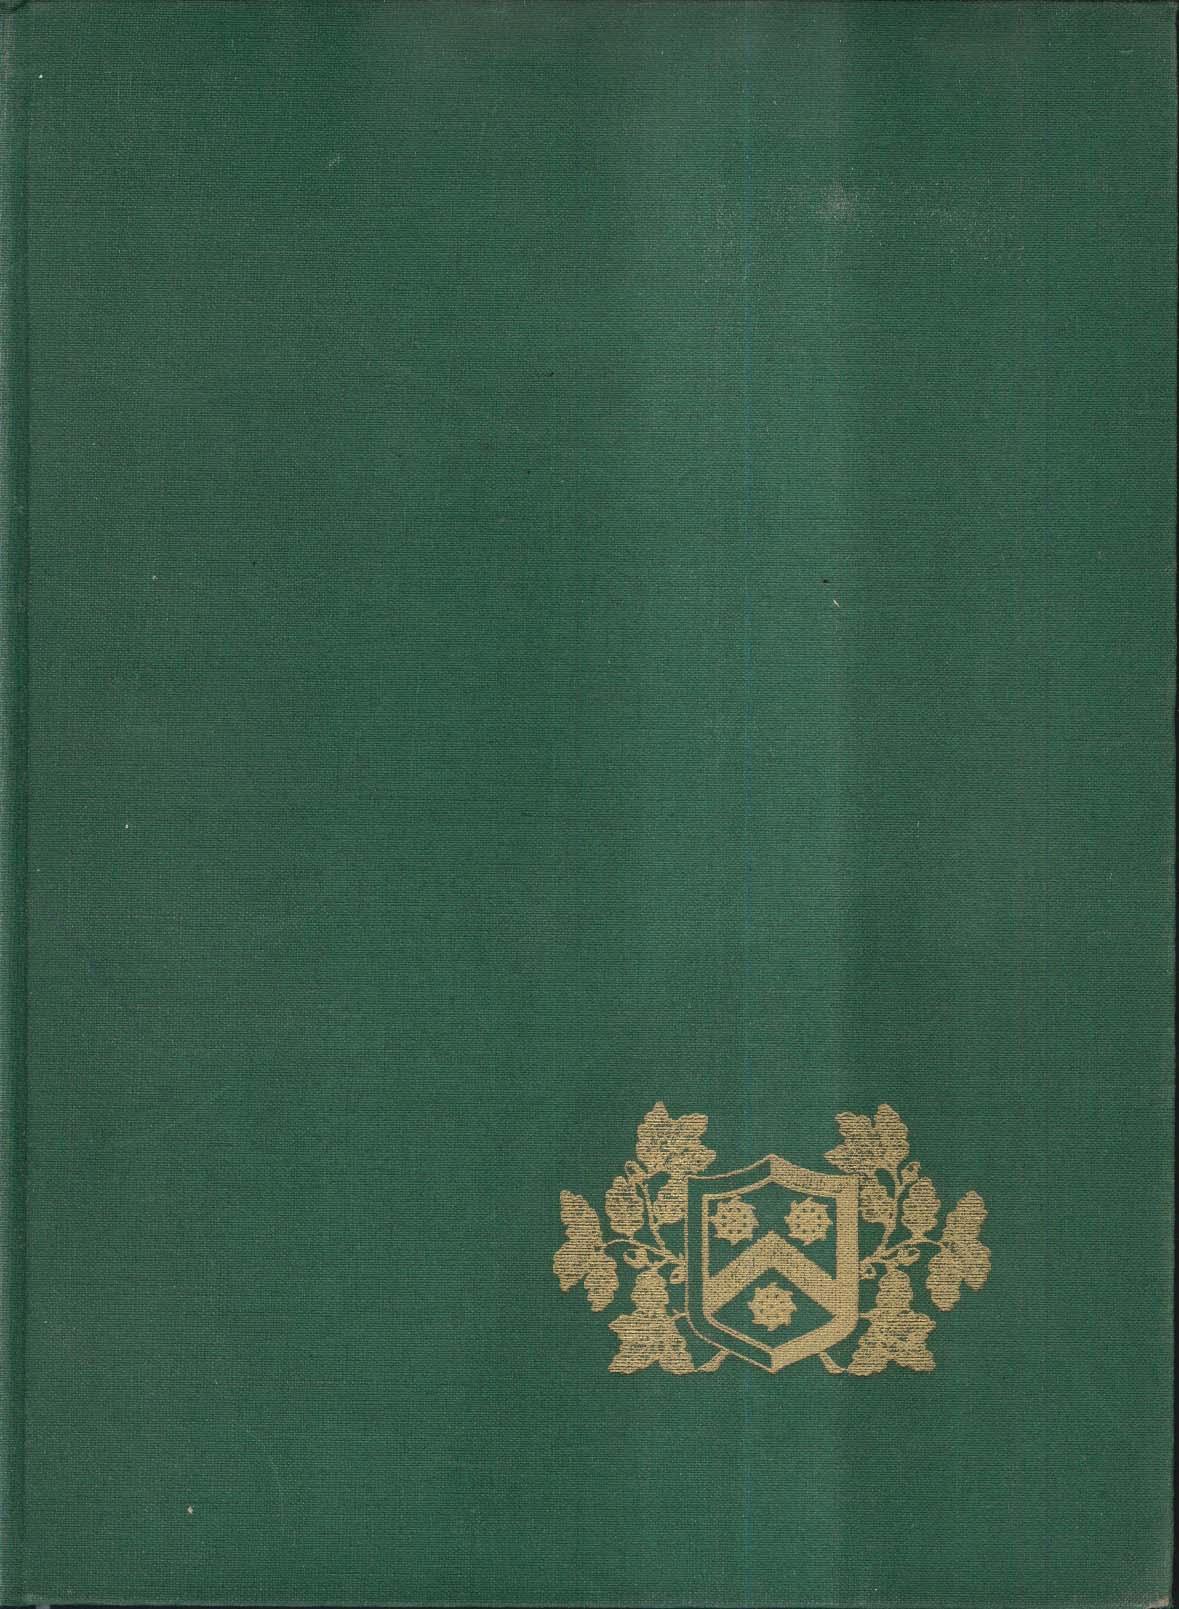 Image for 1943 Wheel Wheelock College Boston Massachusetts MA Yearbook